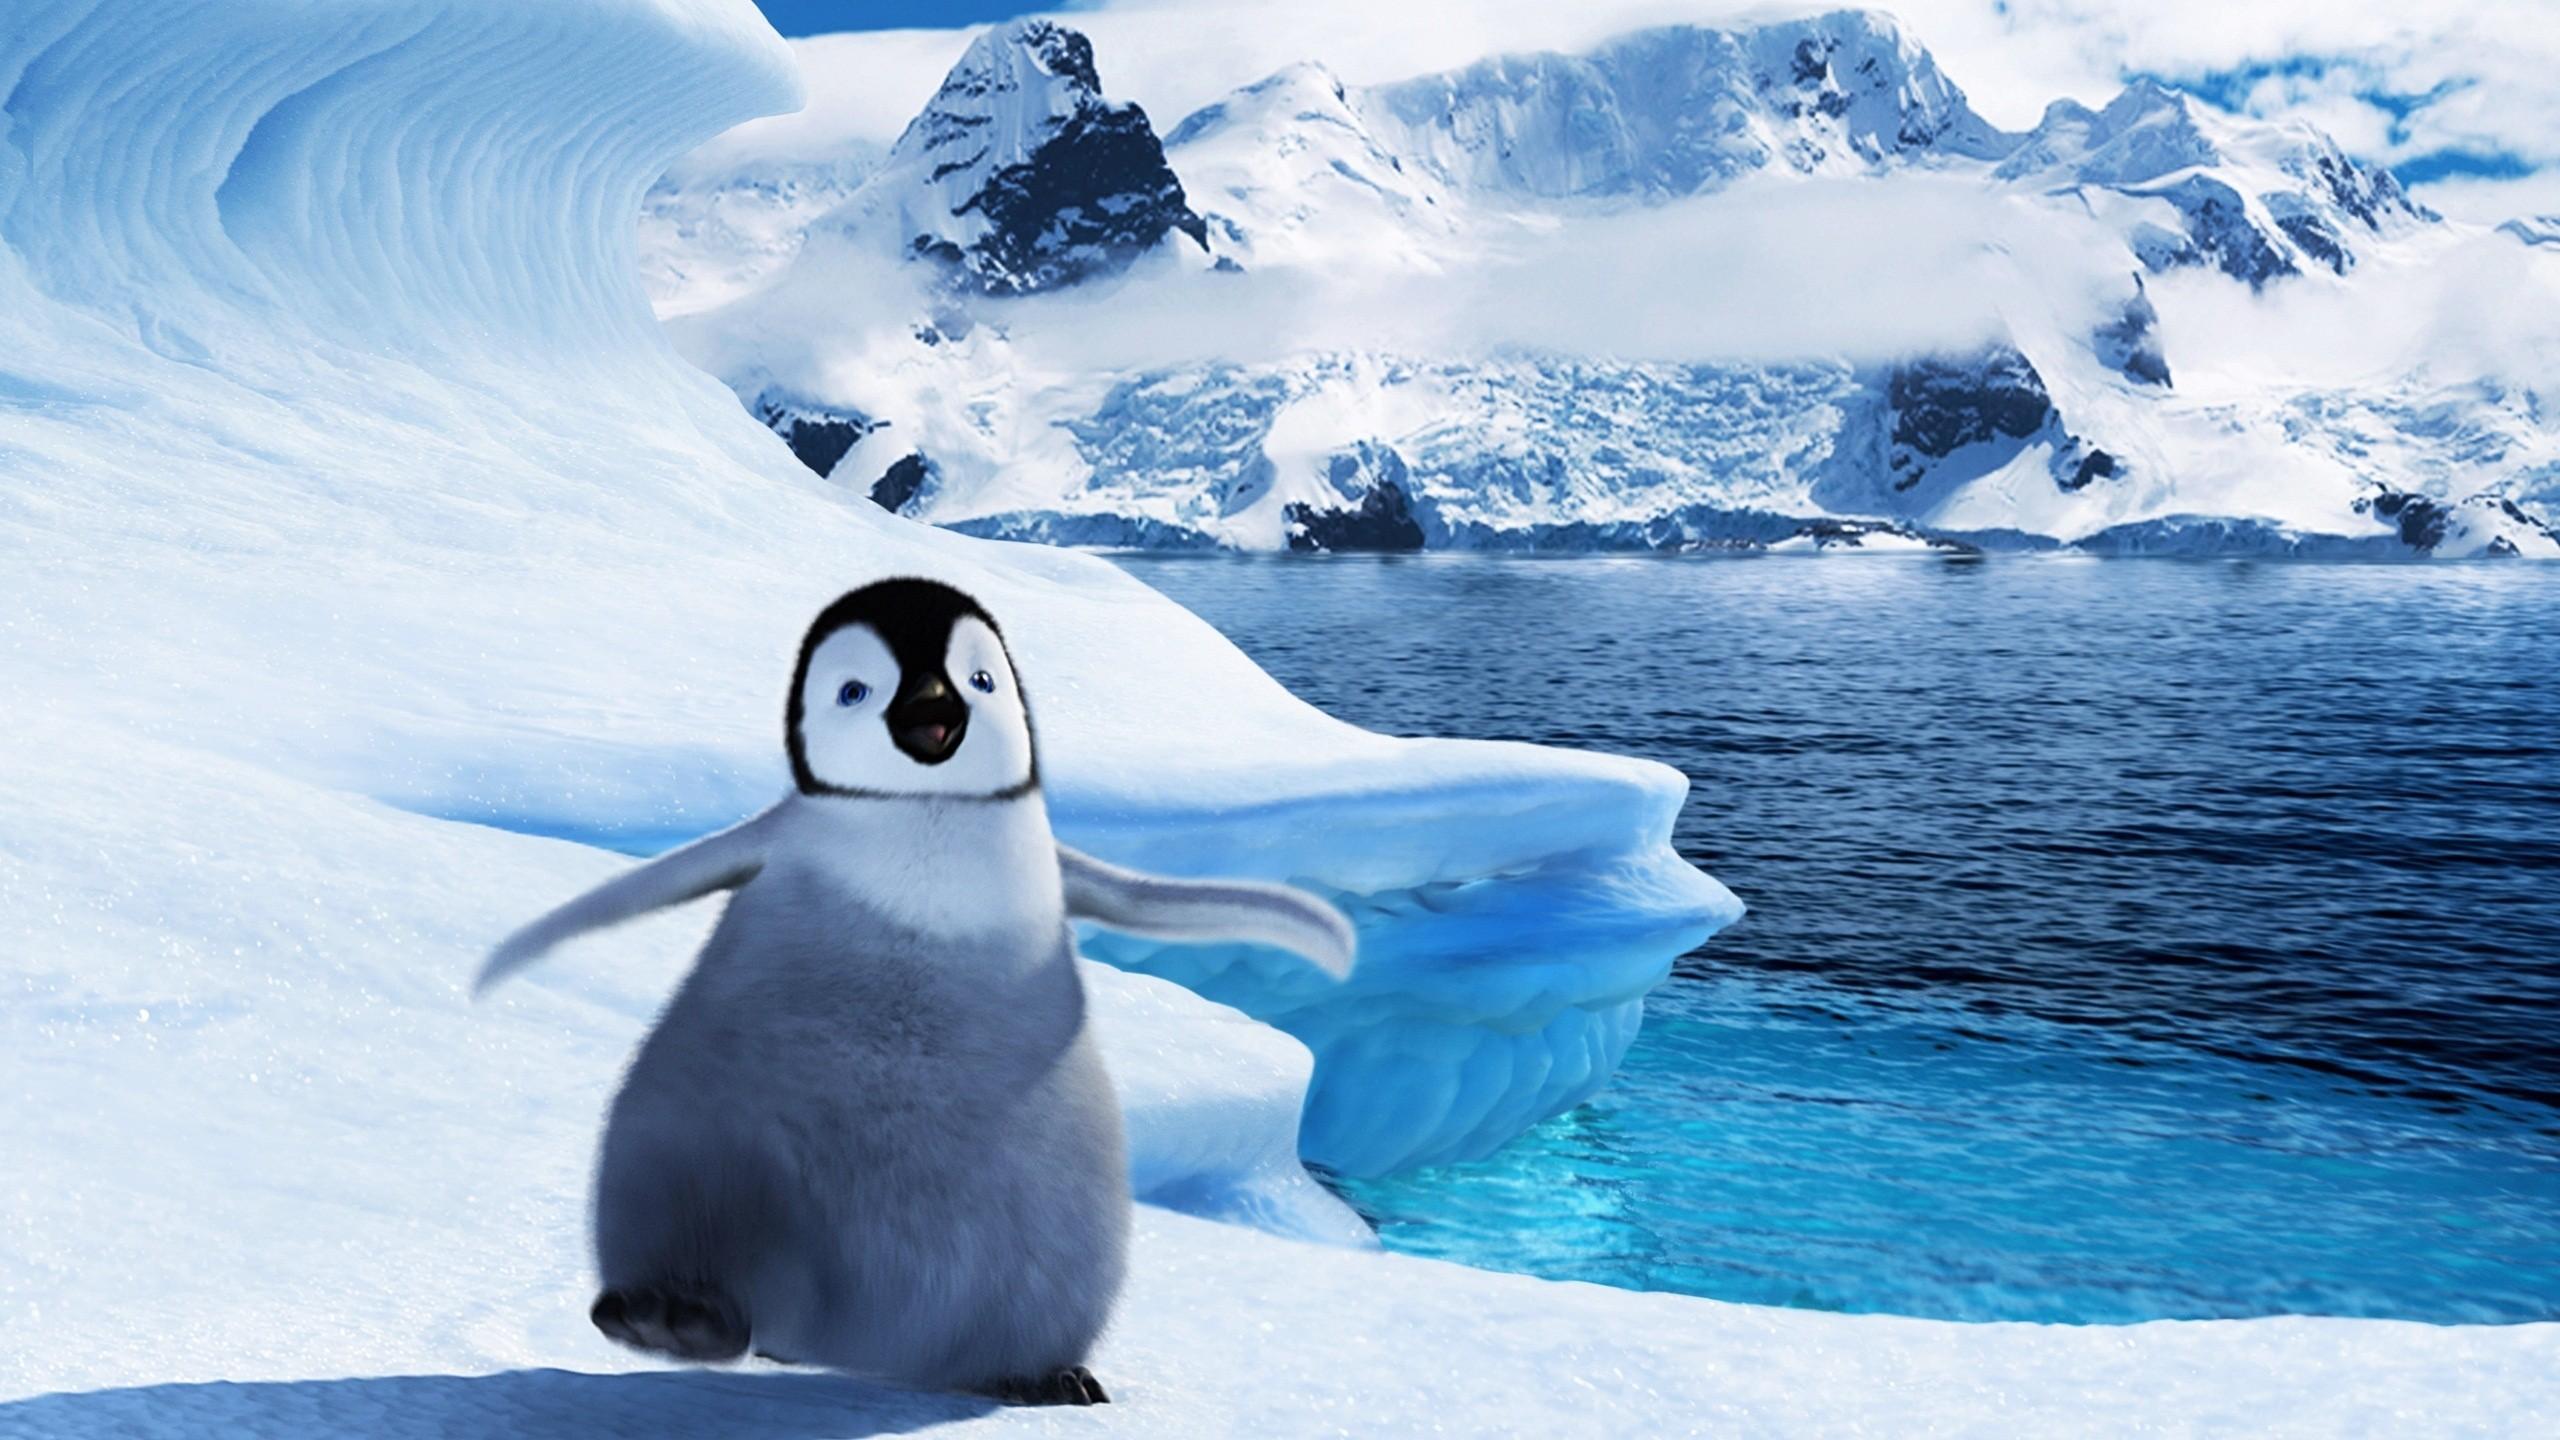 Cute Baby Penguins